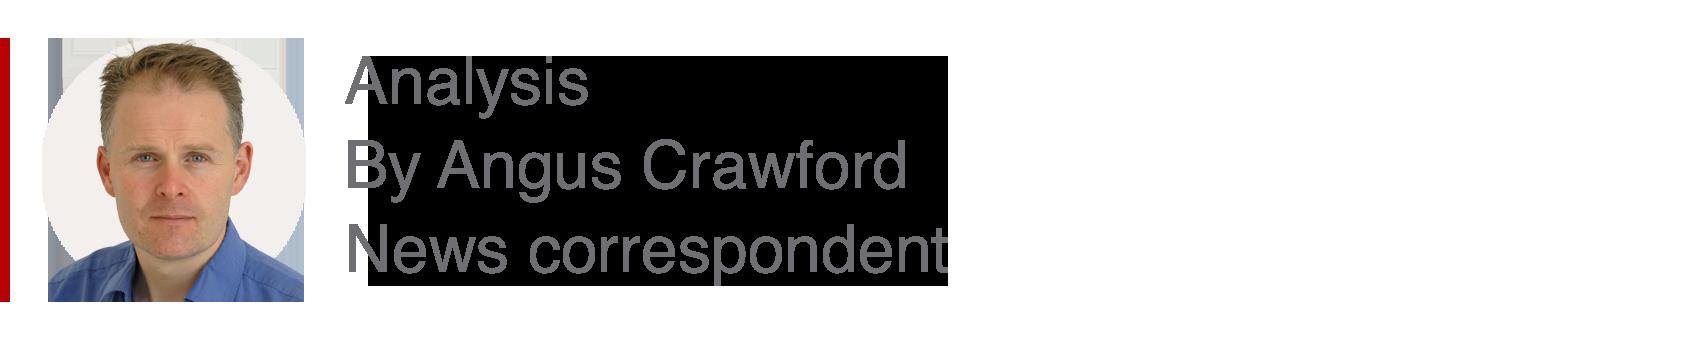 Analysis box by Angus Crawford, news correspondent